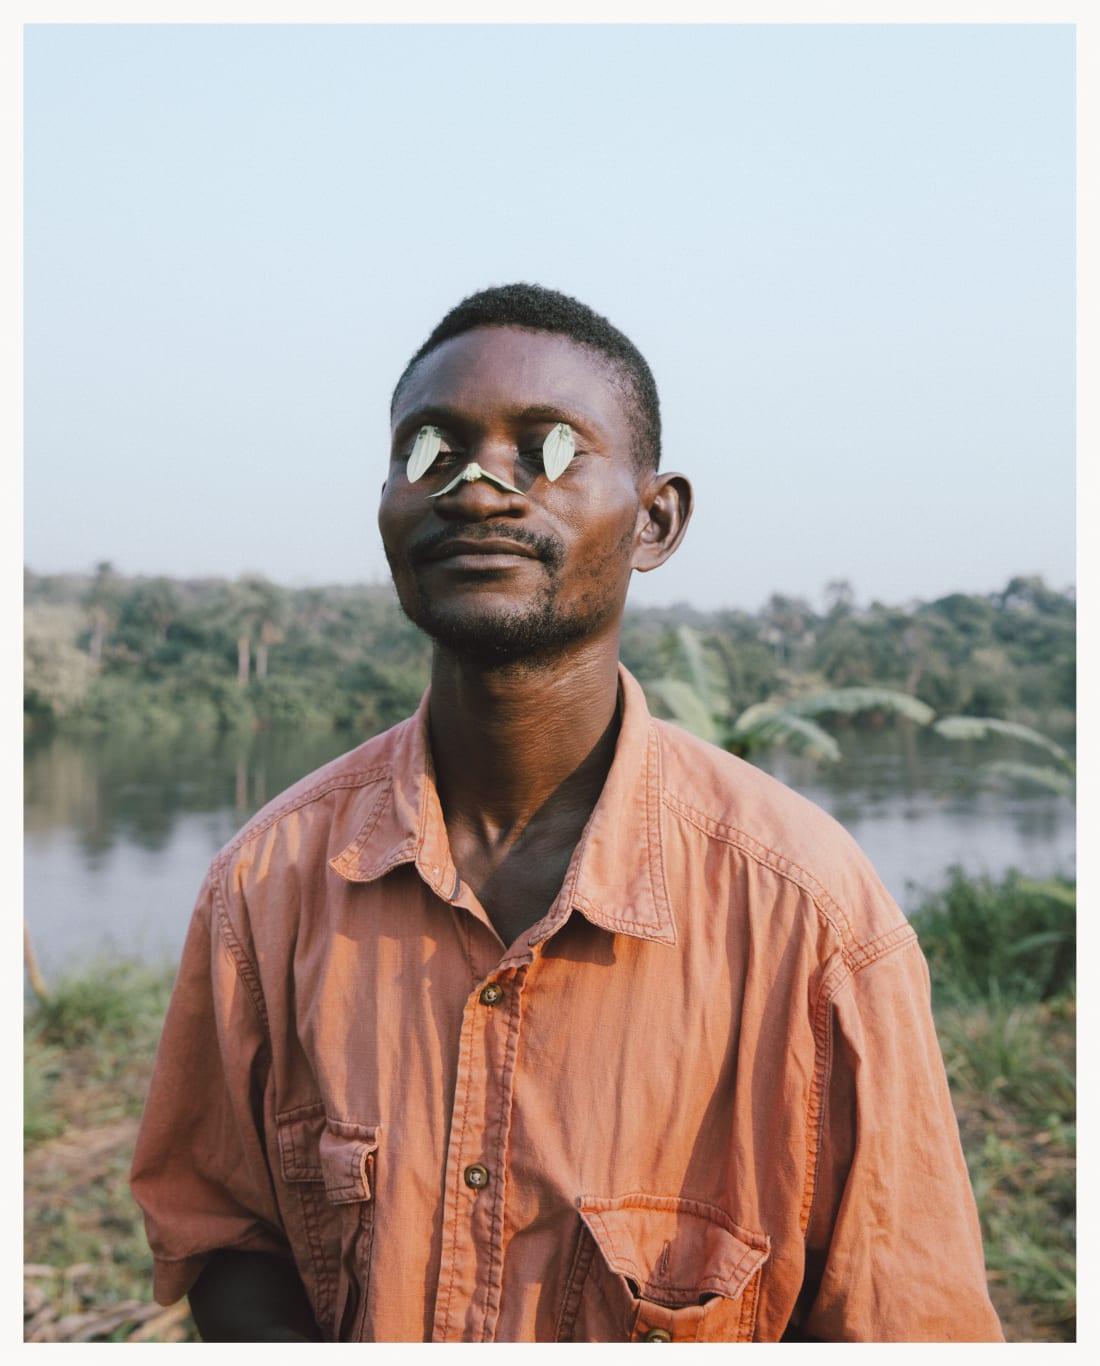 03 Africa Avant Garde Kristin-Lee Moolman photos RESTRICTED